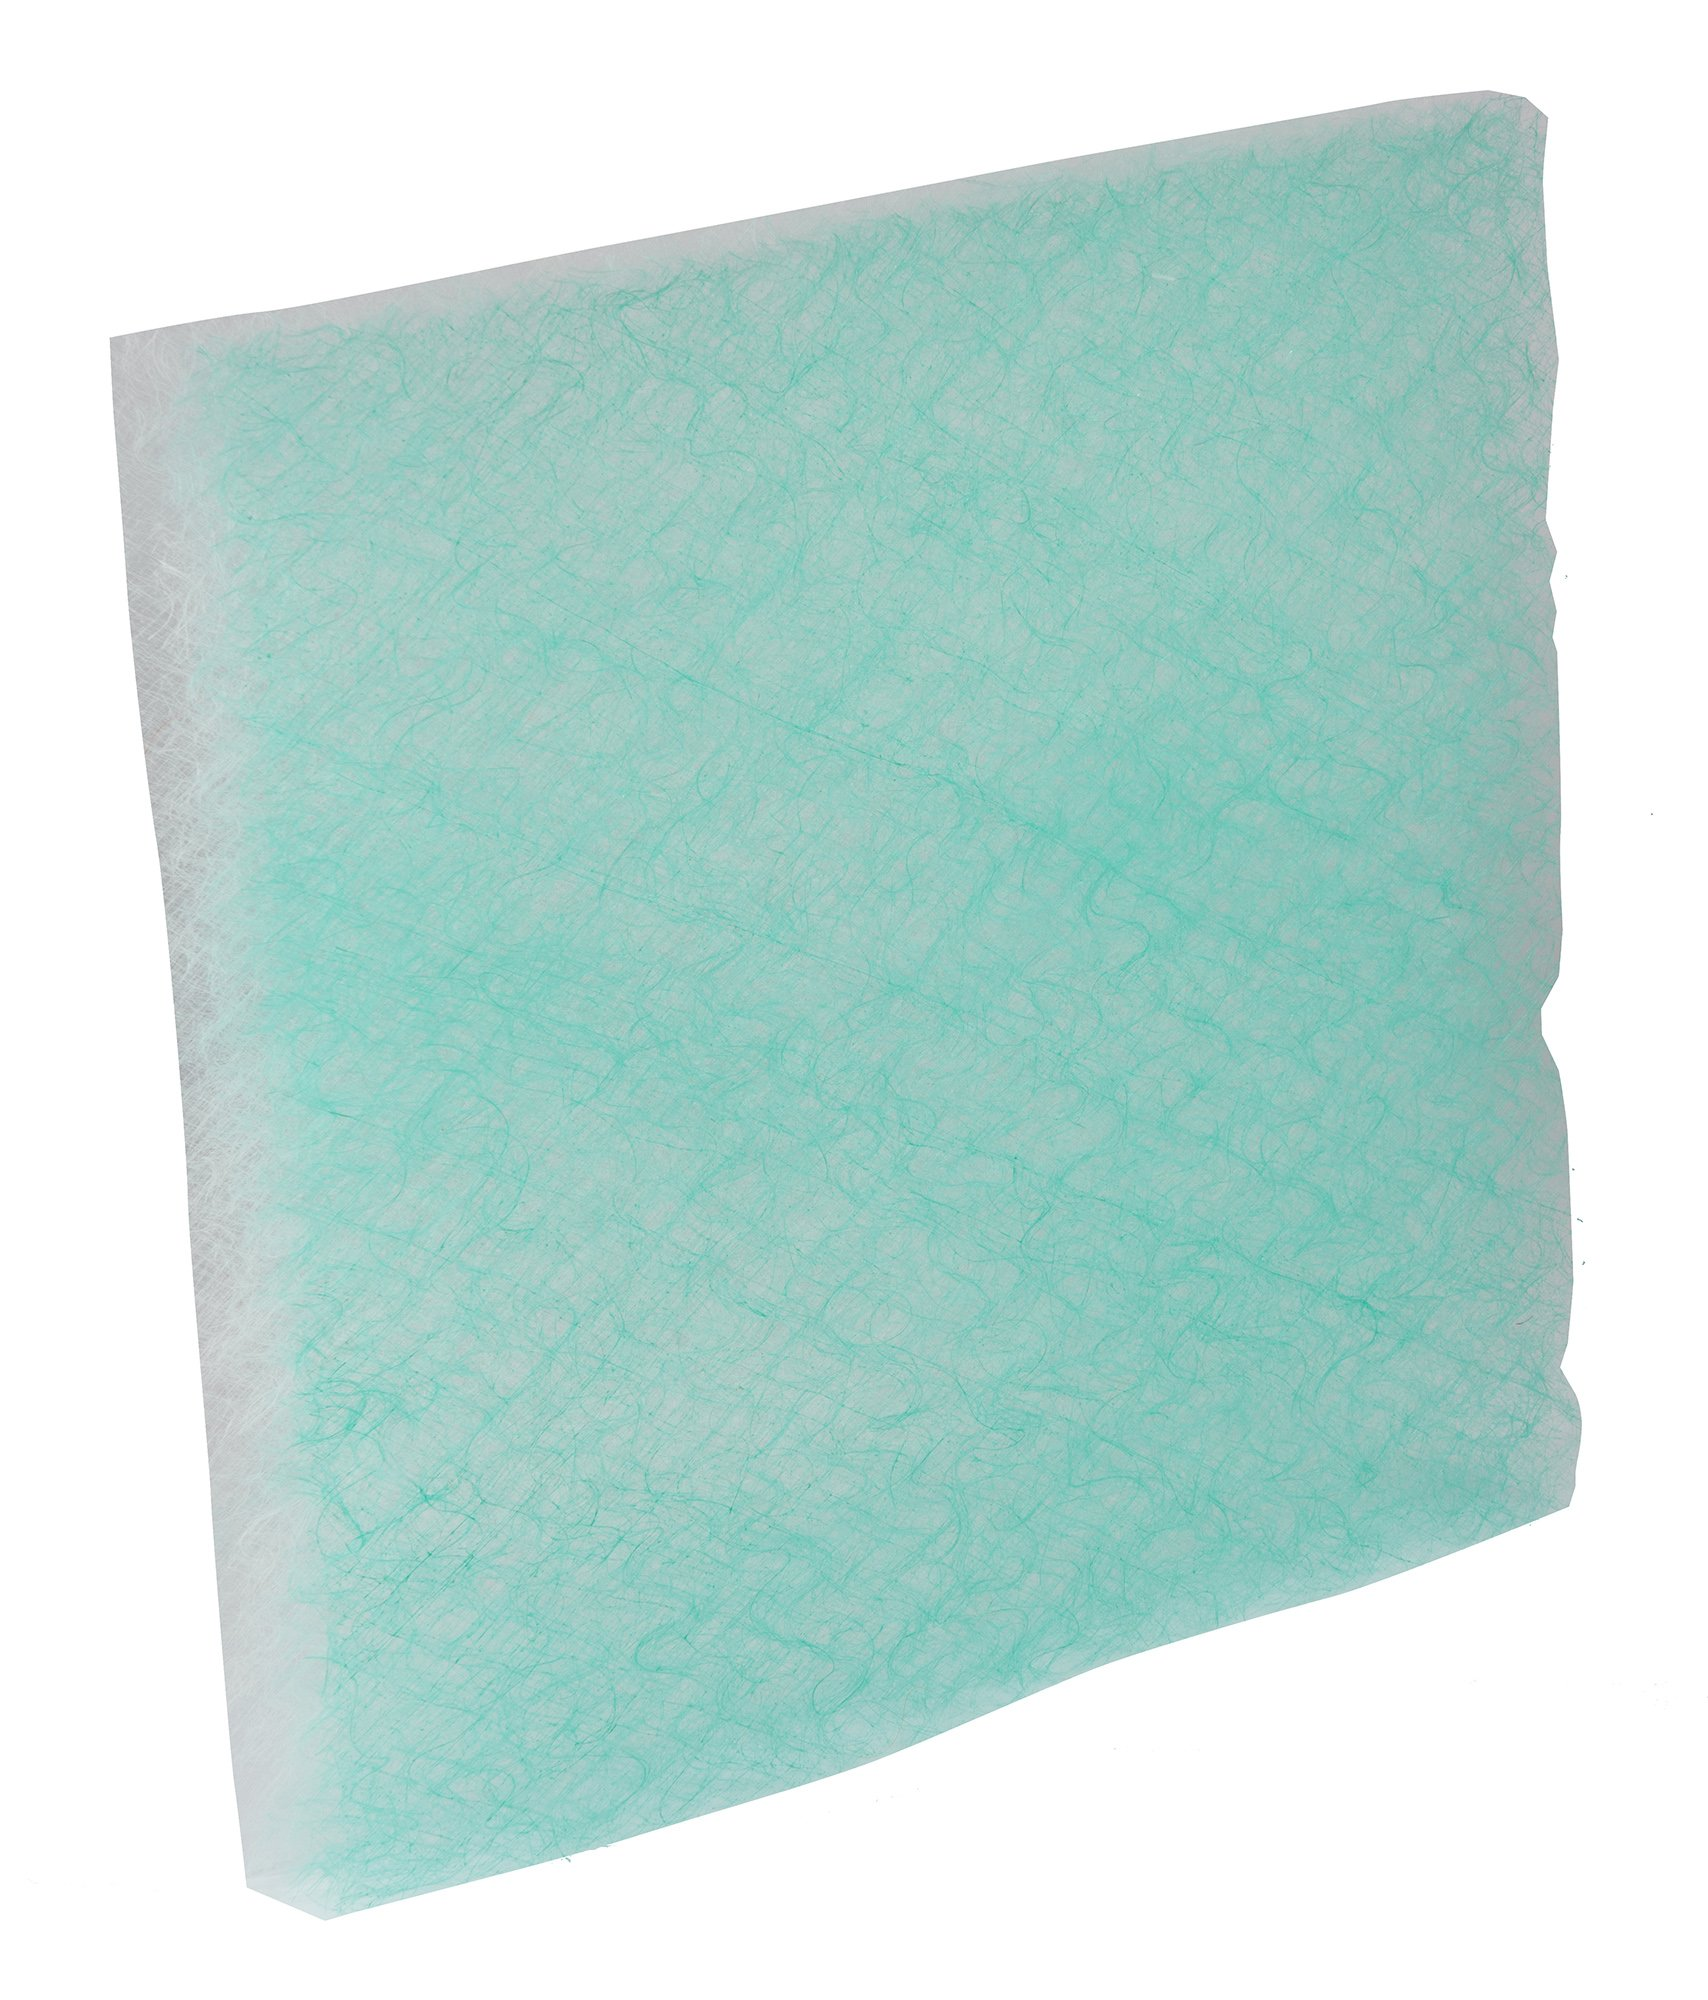 Chemco, 202050PD, 20''x20''x2'' PD Fiberglass Paint Arrestor Pads 50/Box